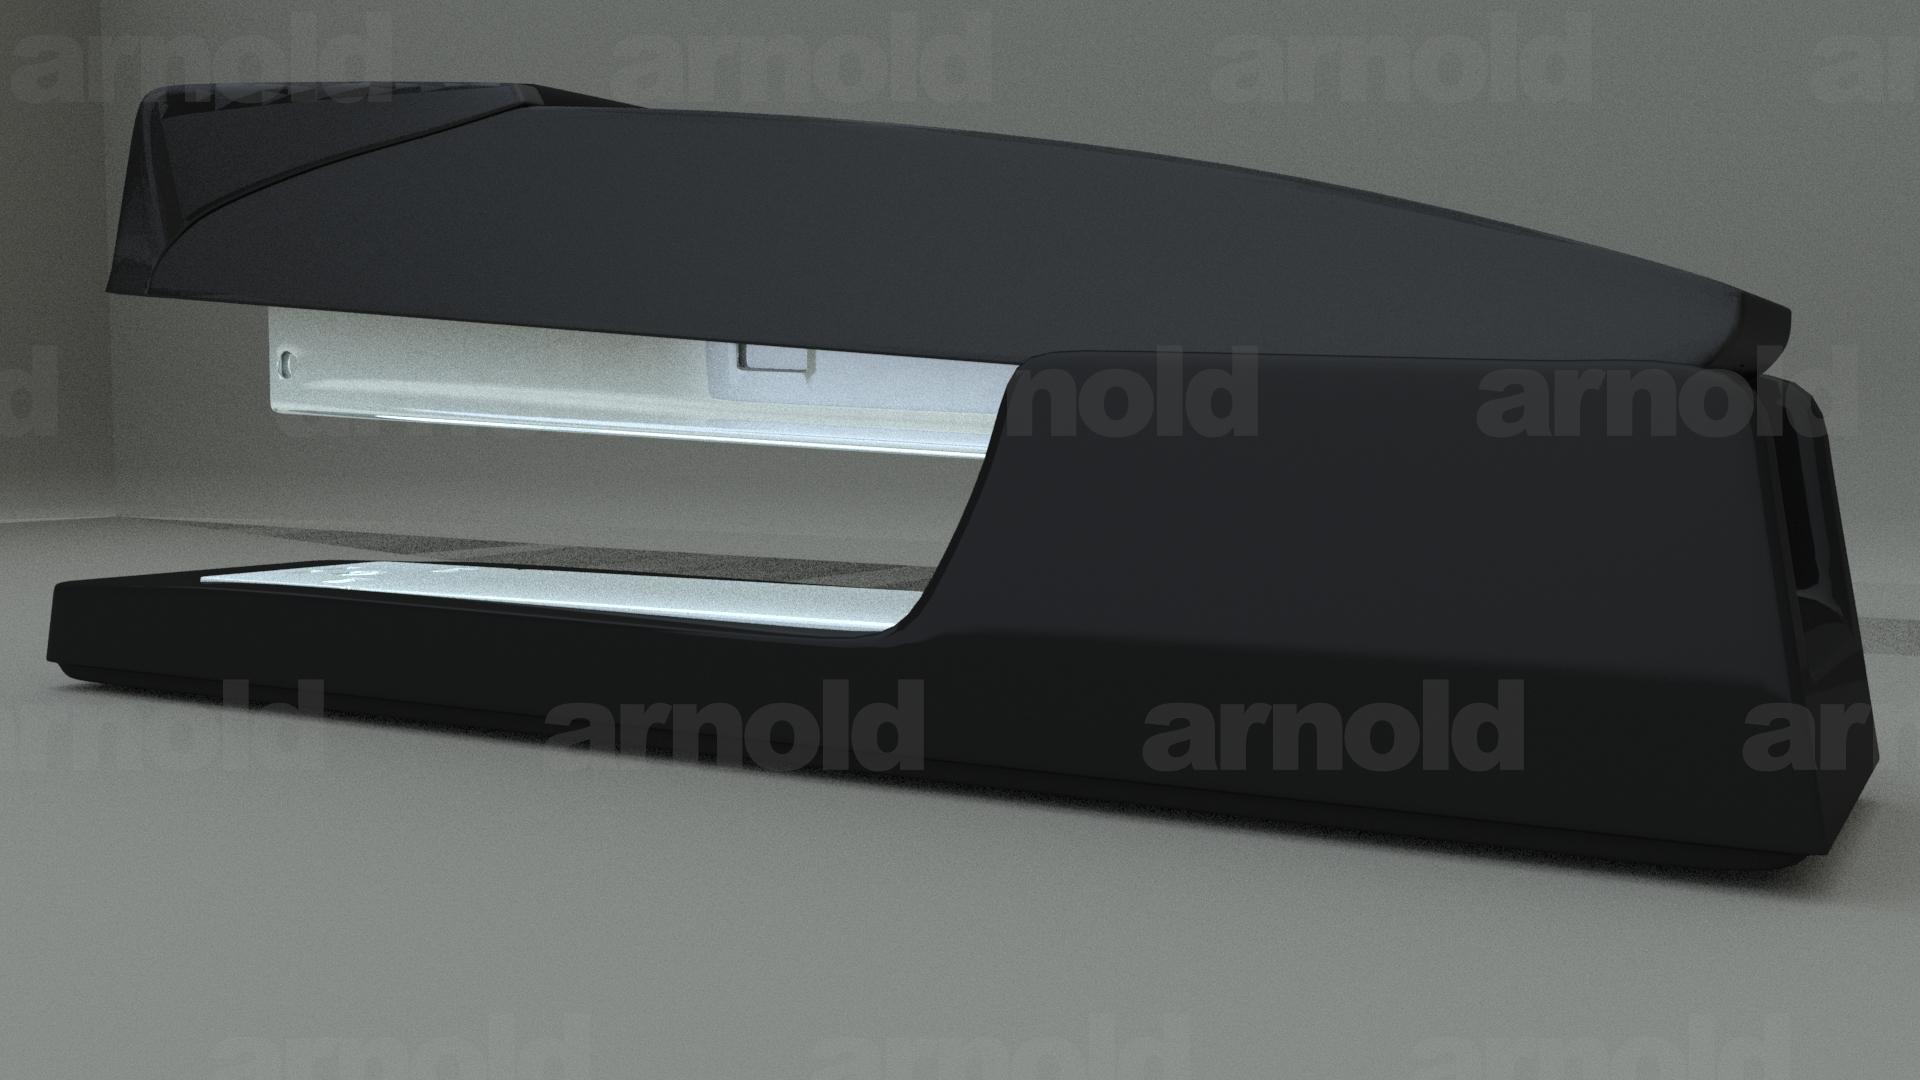 stapler_side_perspec_shaded.jpeg